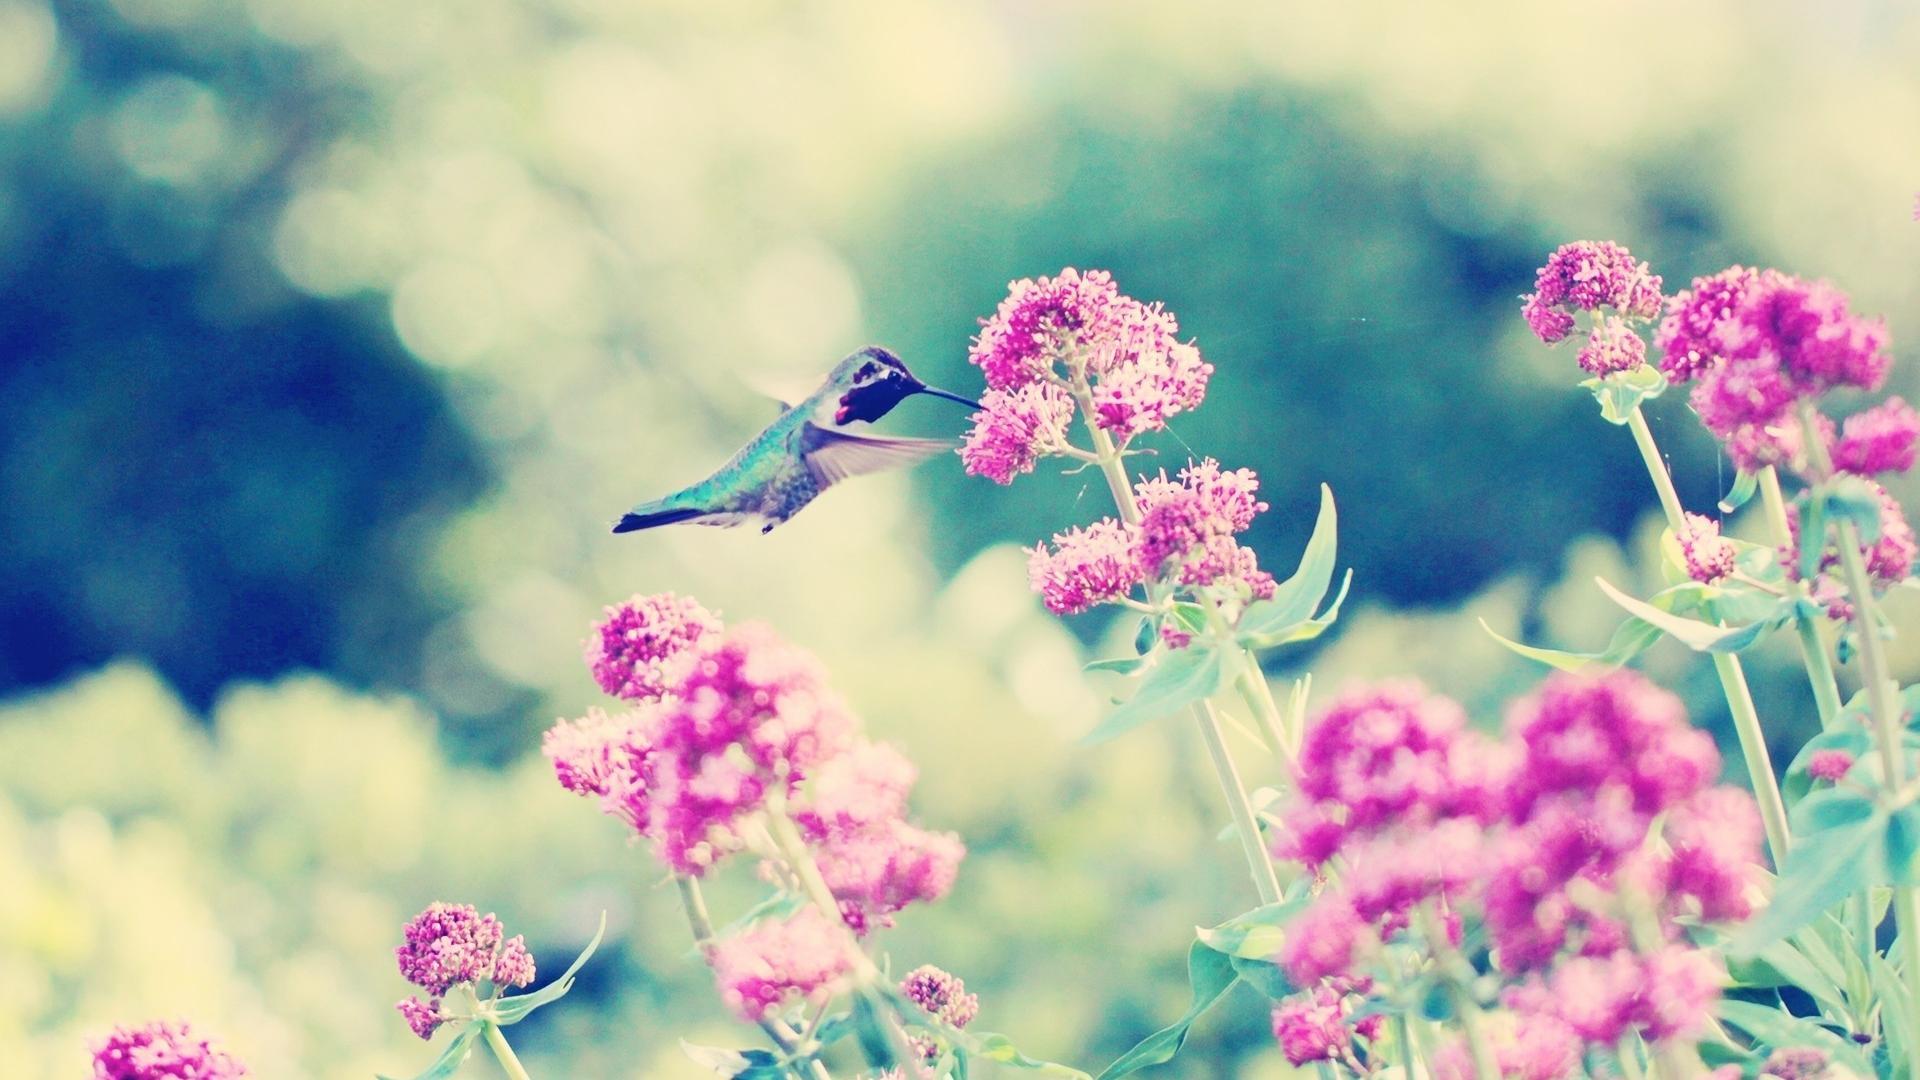 free wallpaper bird hd